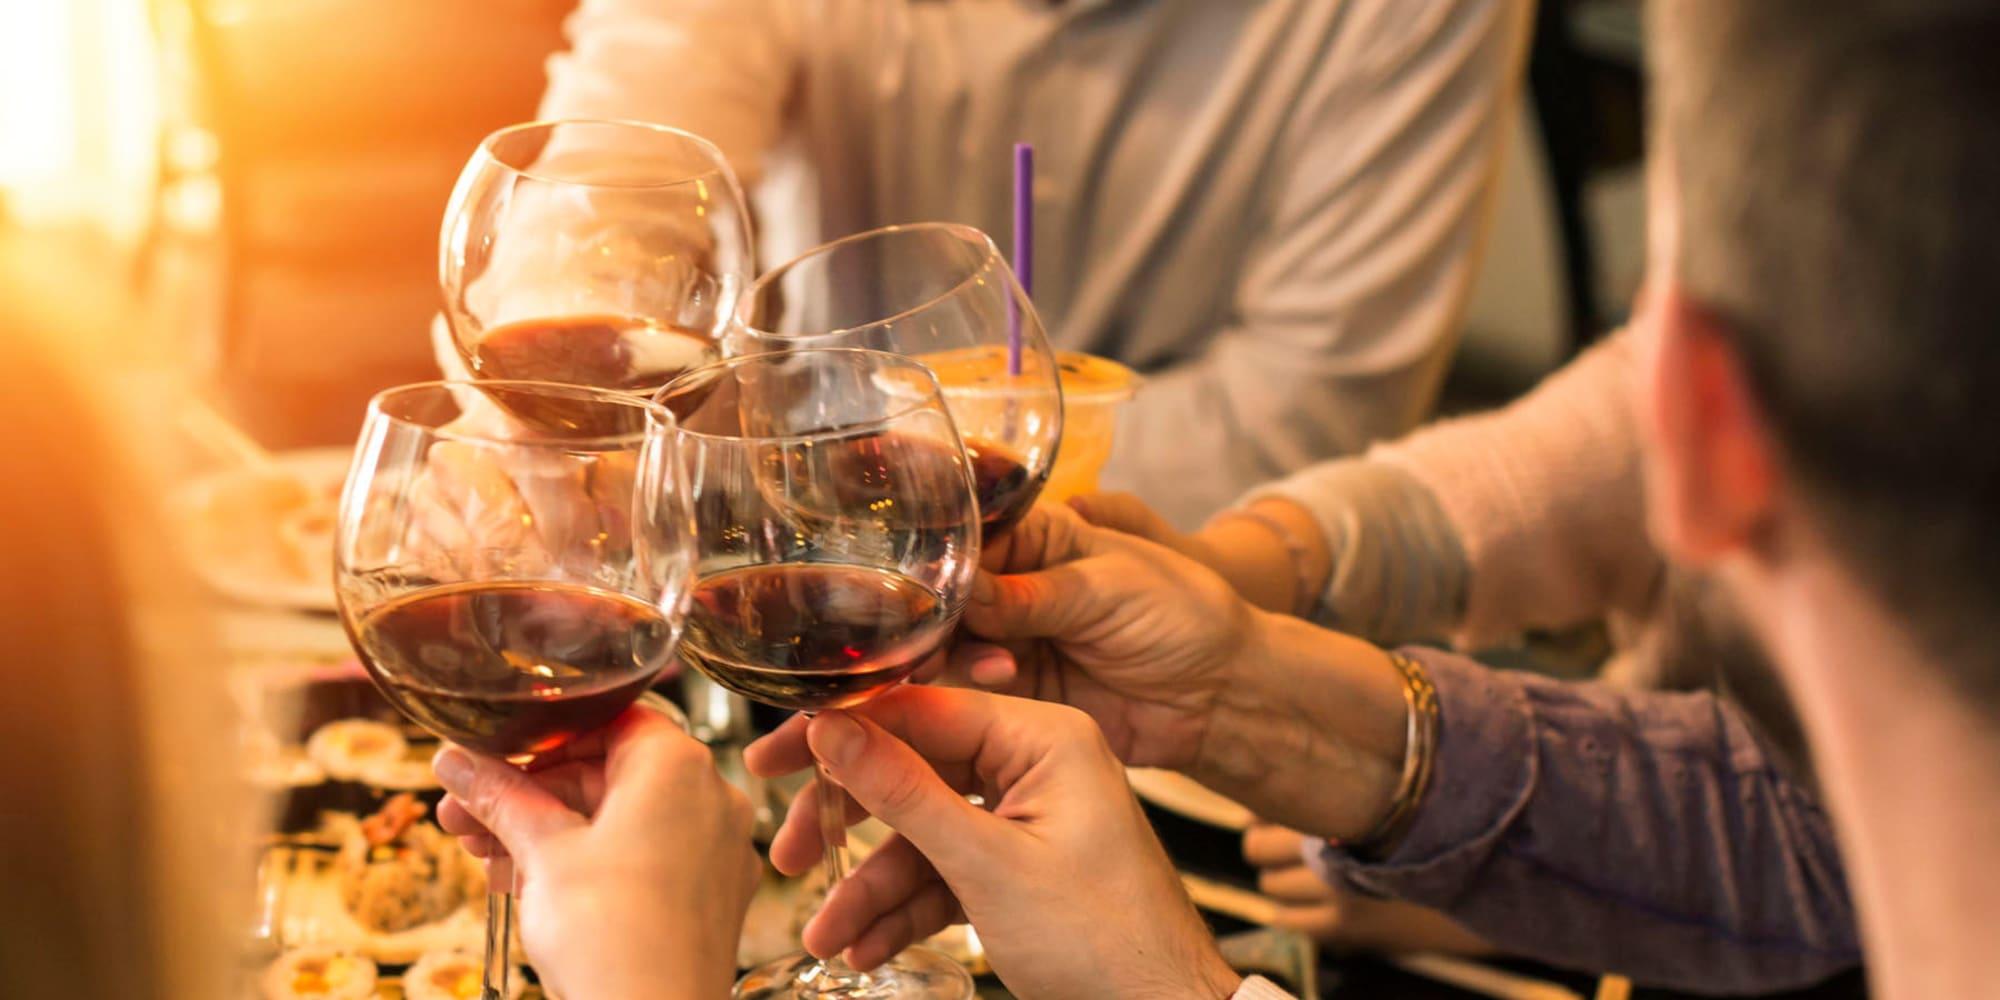 Resident friends enjoying wine and lively conversation at their favorite restaurant near Pleasanton Glen Apartment Homes in Pleasanton, California